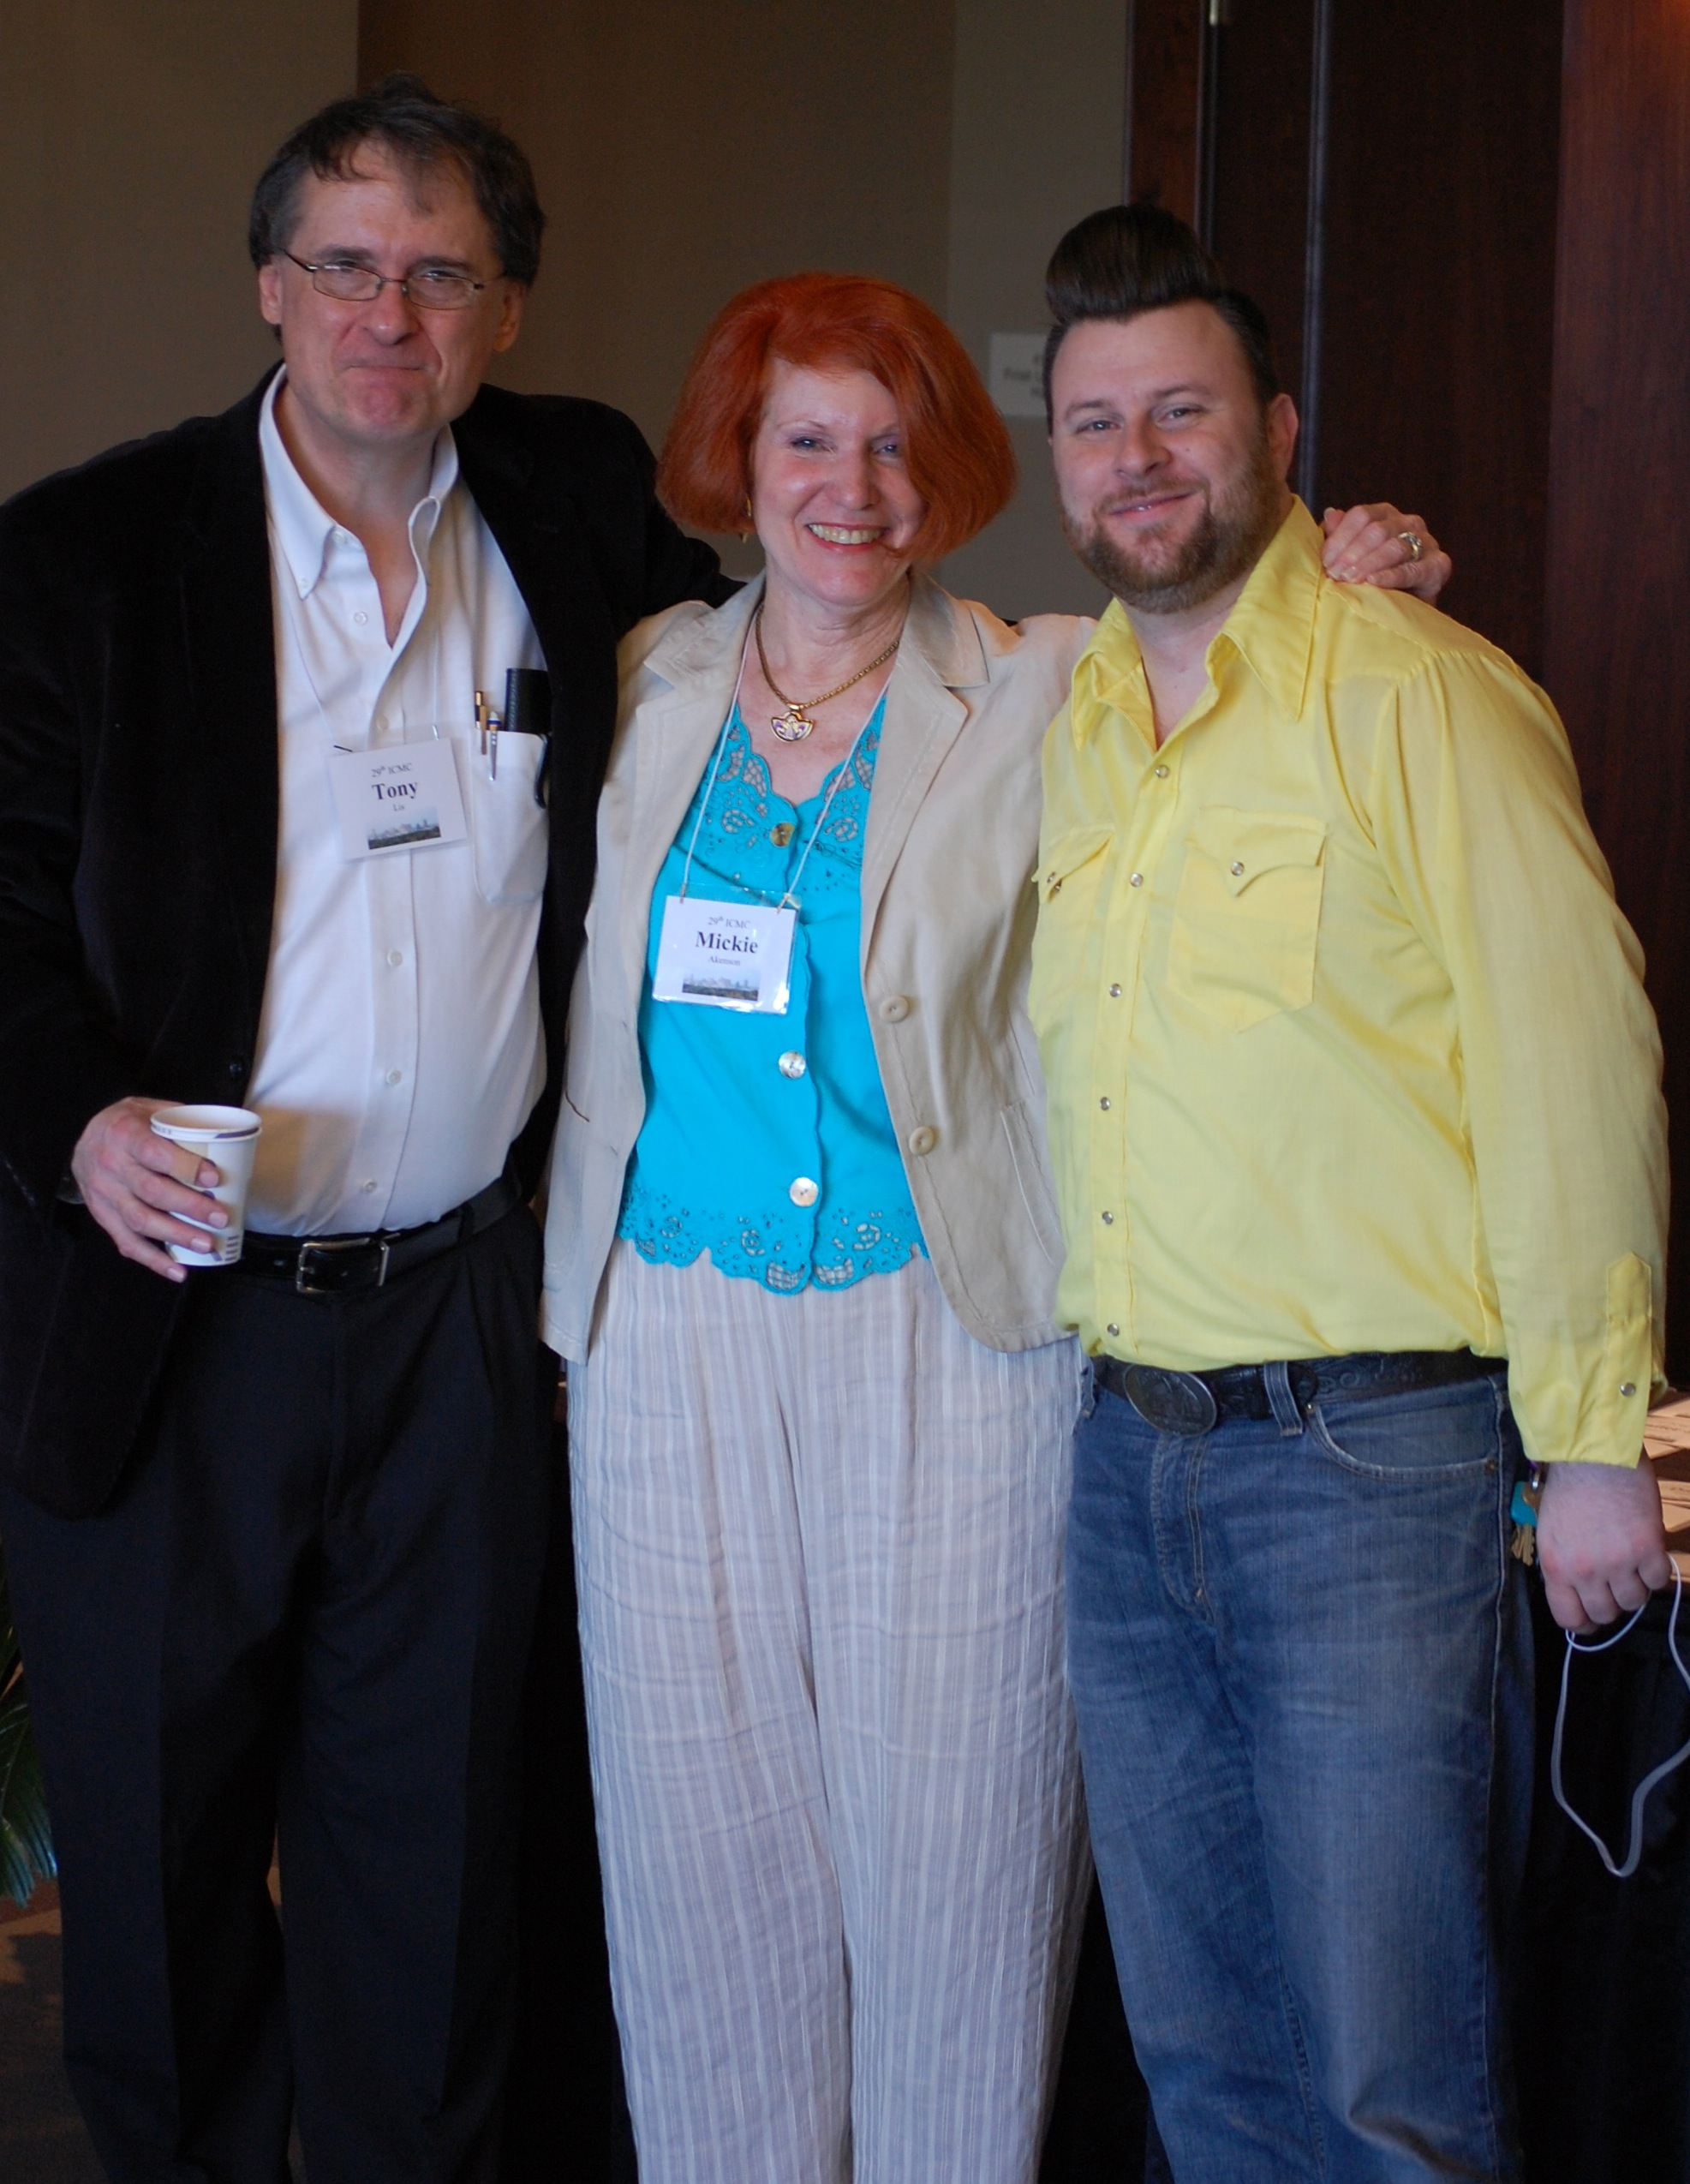 L to R Tony Lis, Mickie Akenson, Nate Gibson ICMC 2012